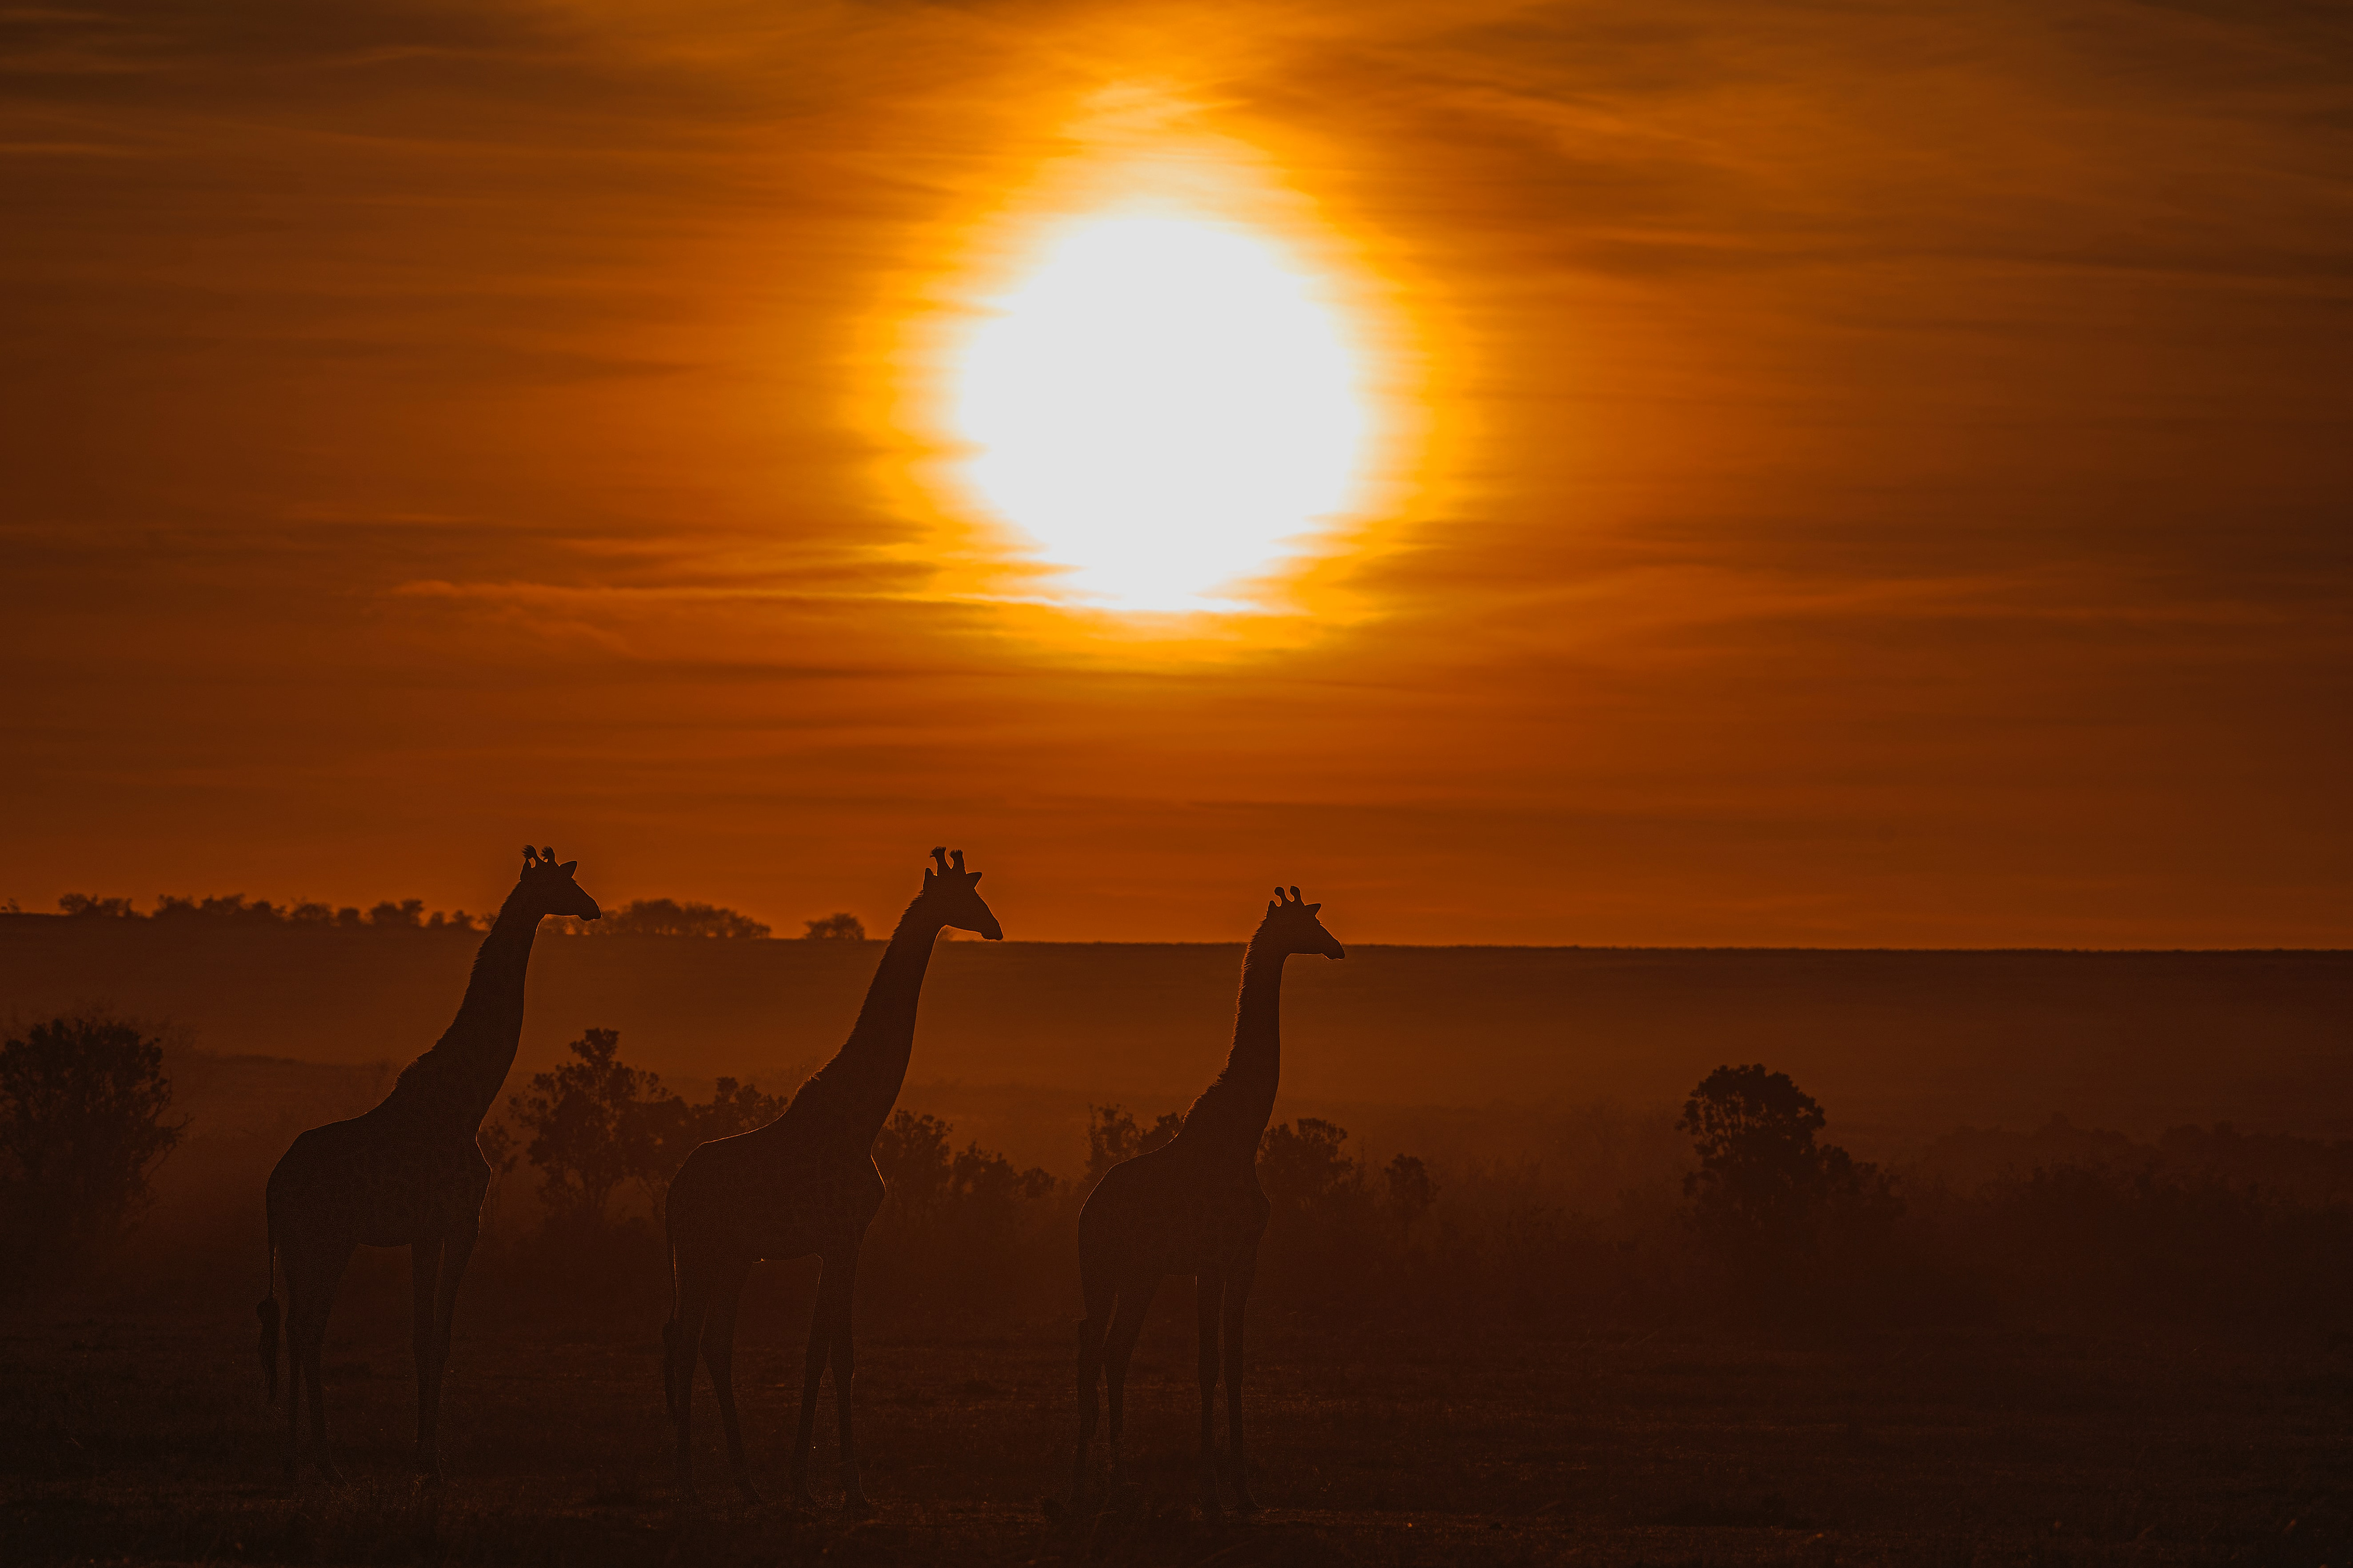 giraffe silhouette 4k 1629139604 - Giraffe Silhouette 4k - Giraffe Silhouette wallpapers, Giraffe Silhouette 4k wallpapers